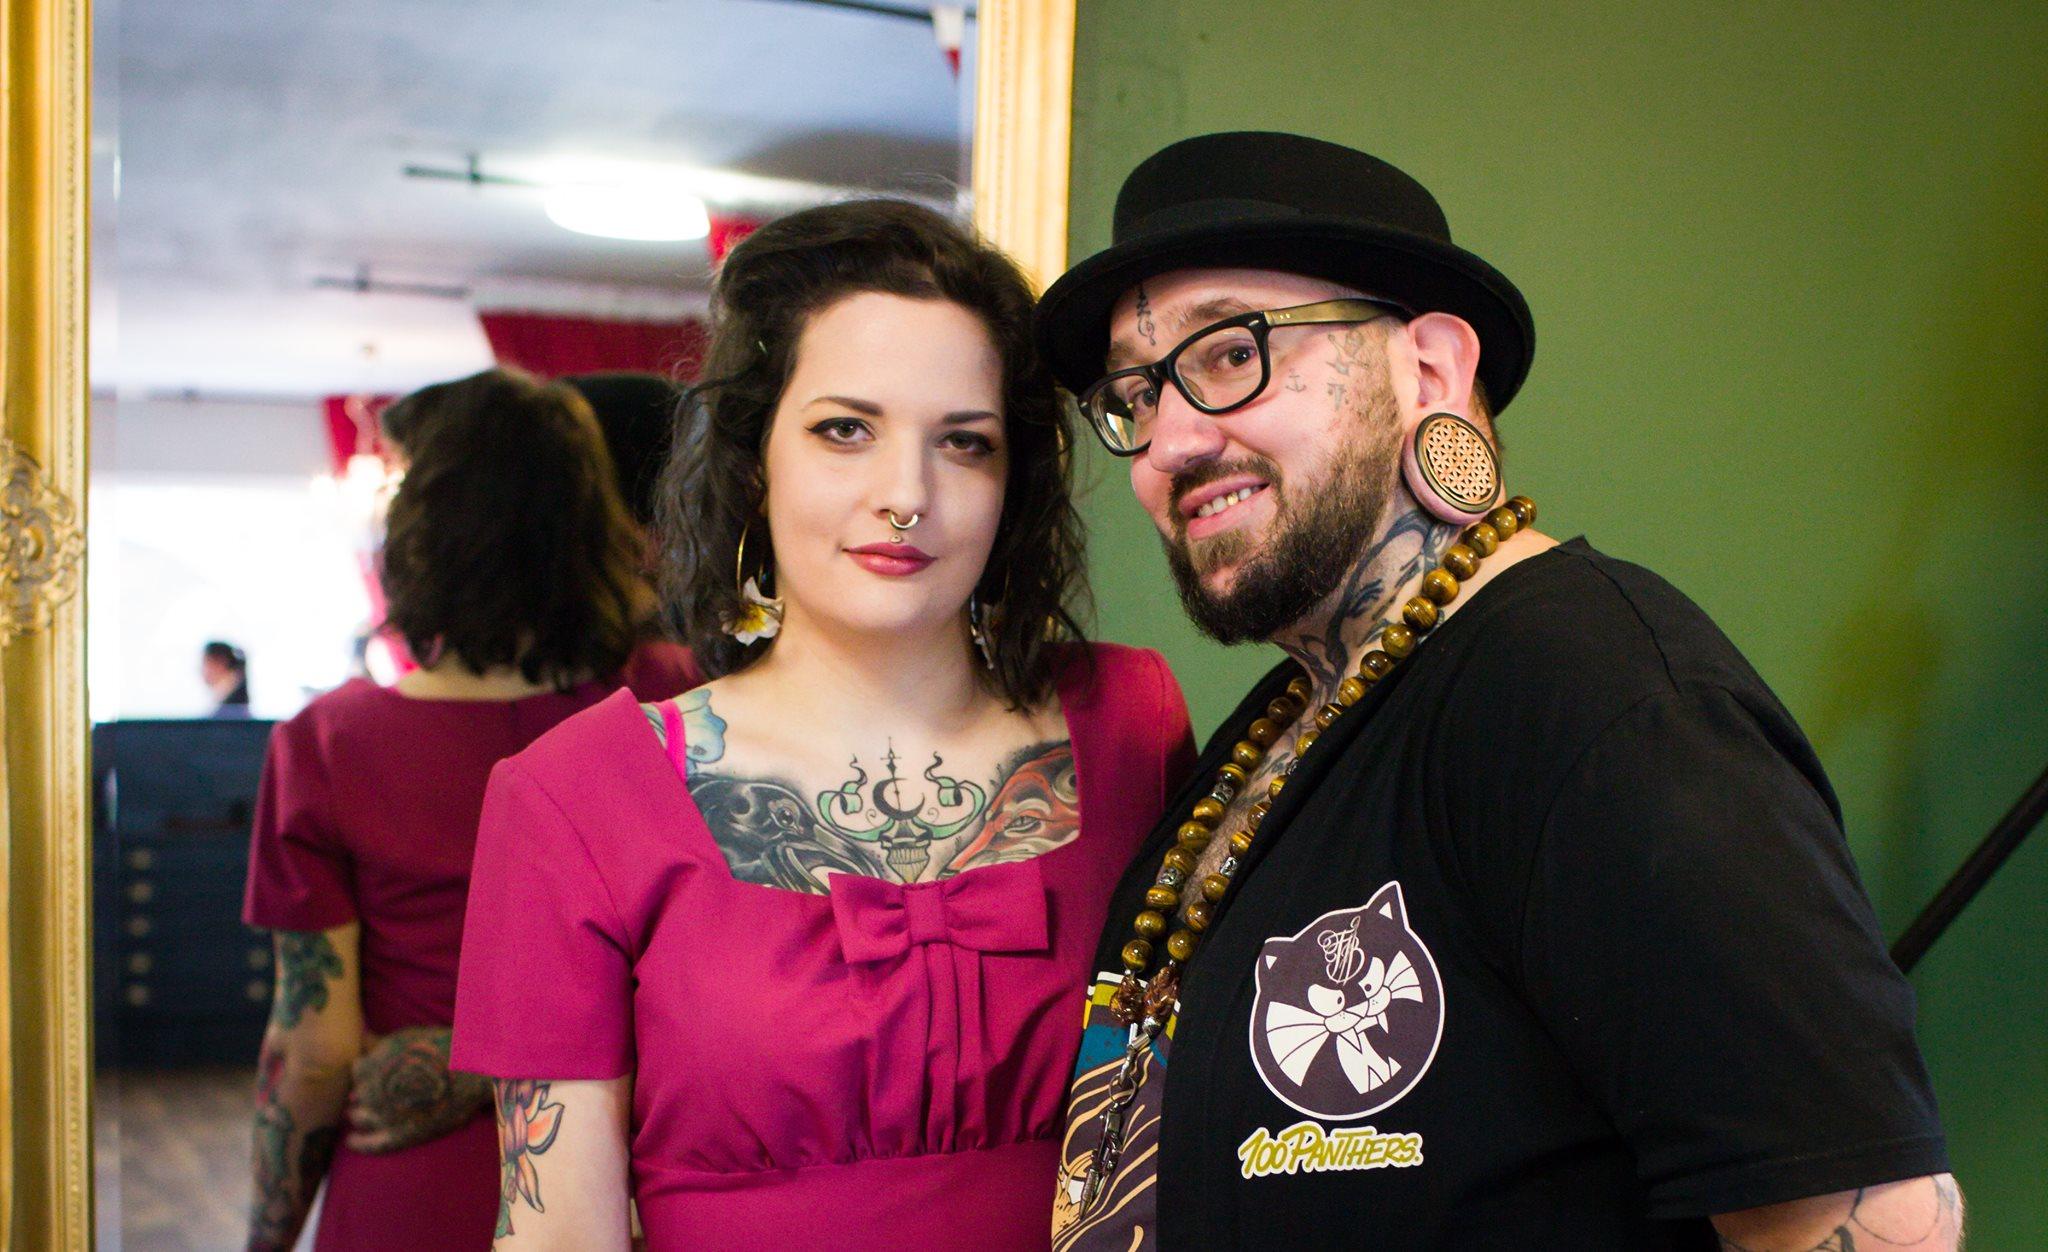 Art On Skin By Belgian Tattoo Duo: Sarah & Jeroen Electrum